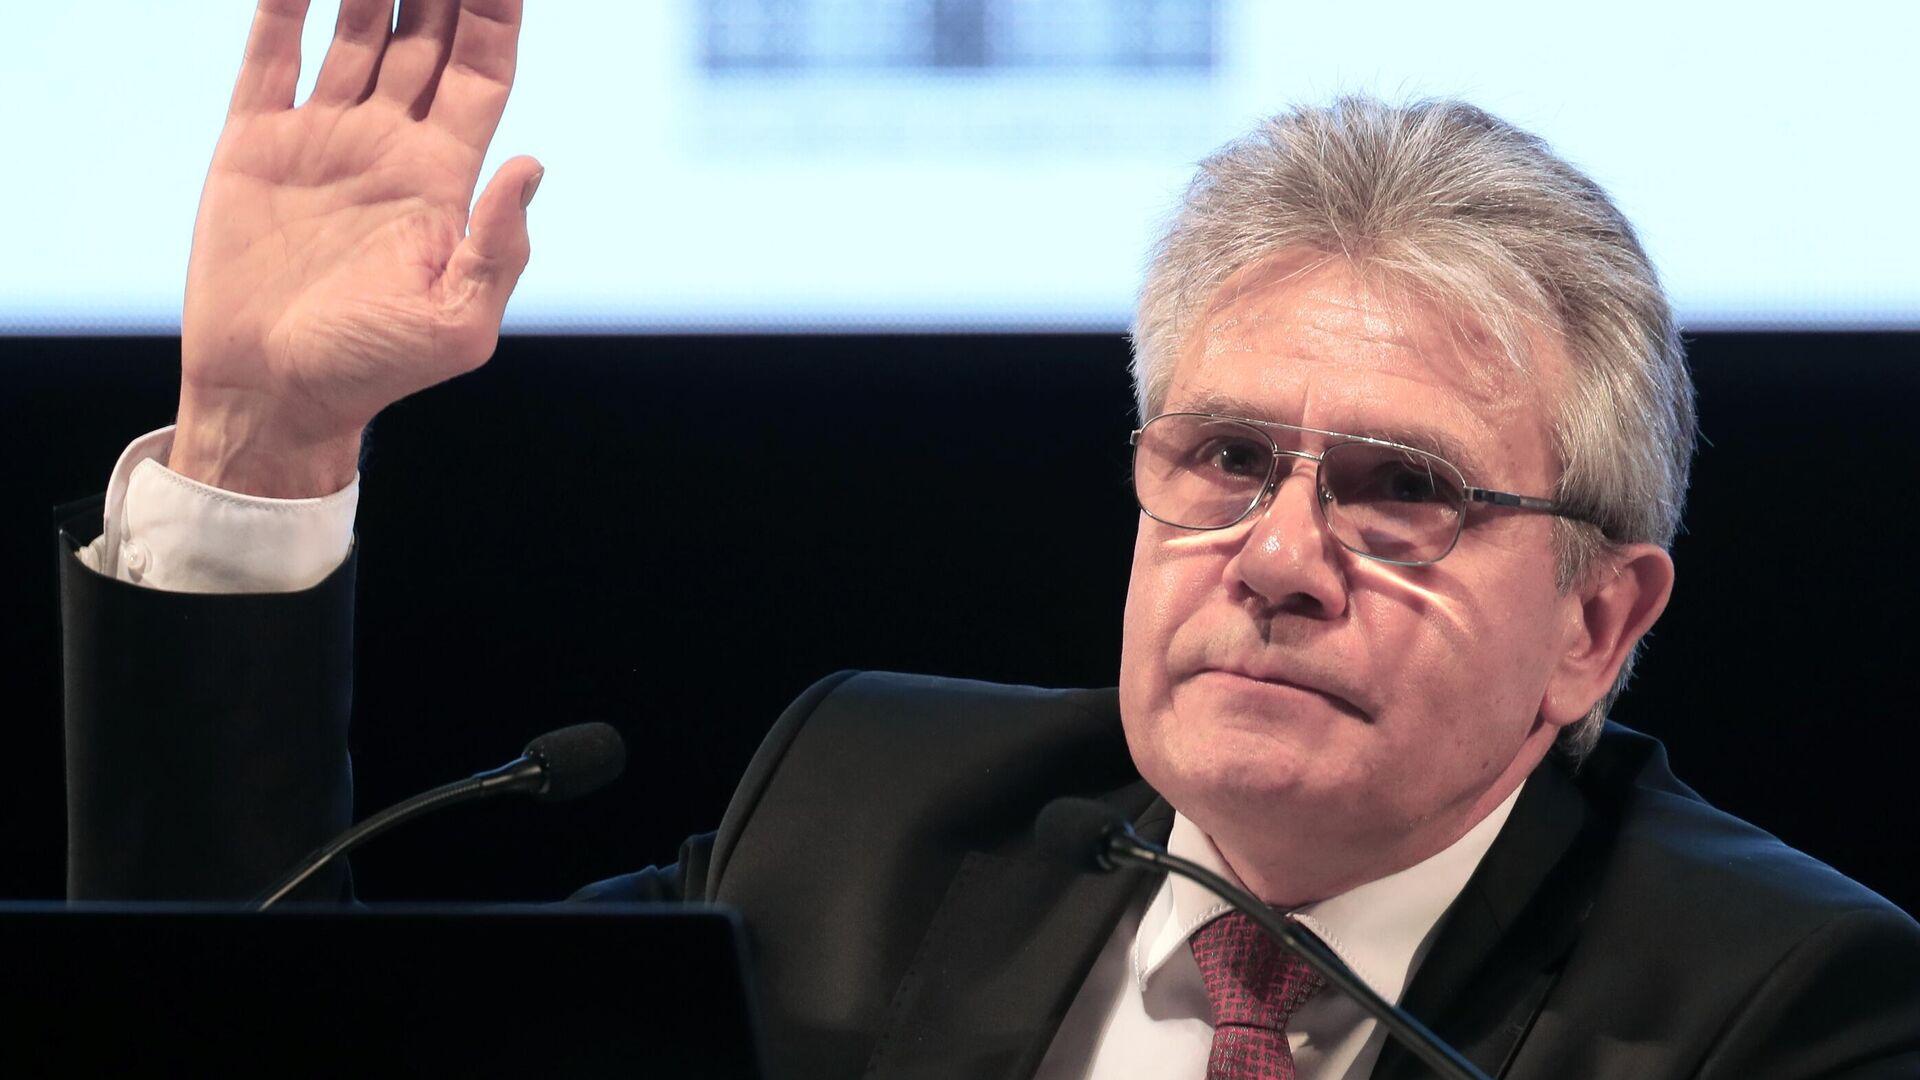 Глава РАН назвал сотрудничество с США в космосе залогом мира